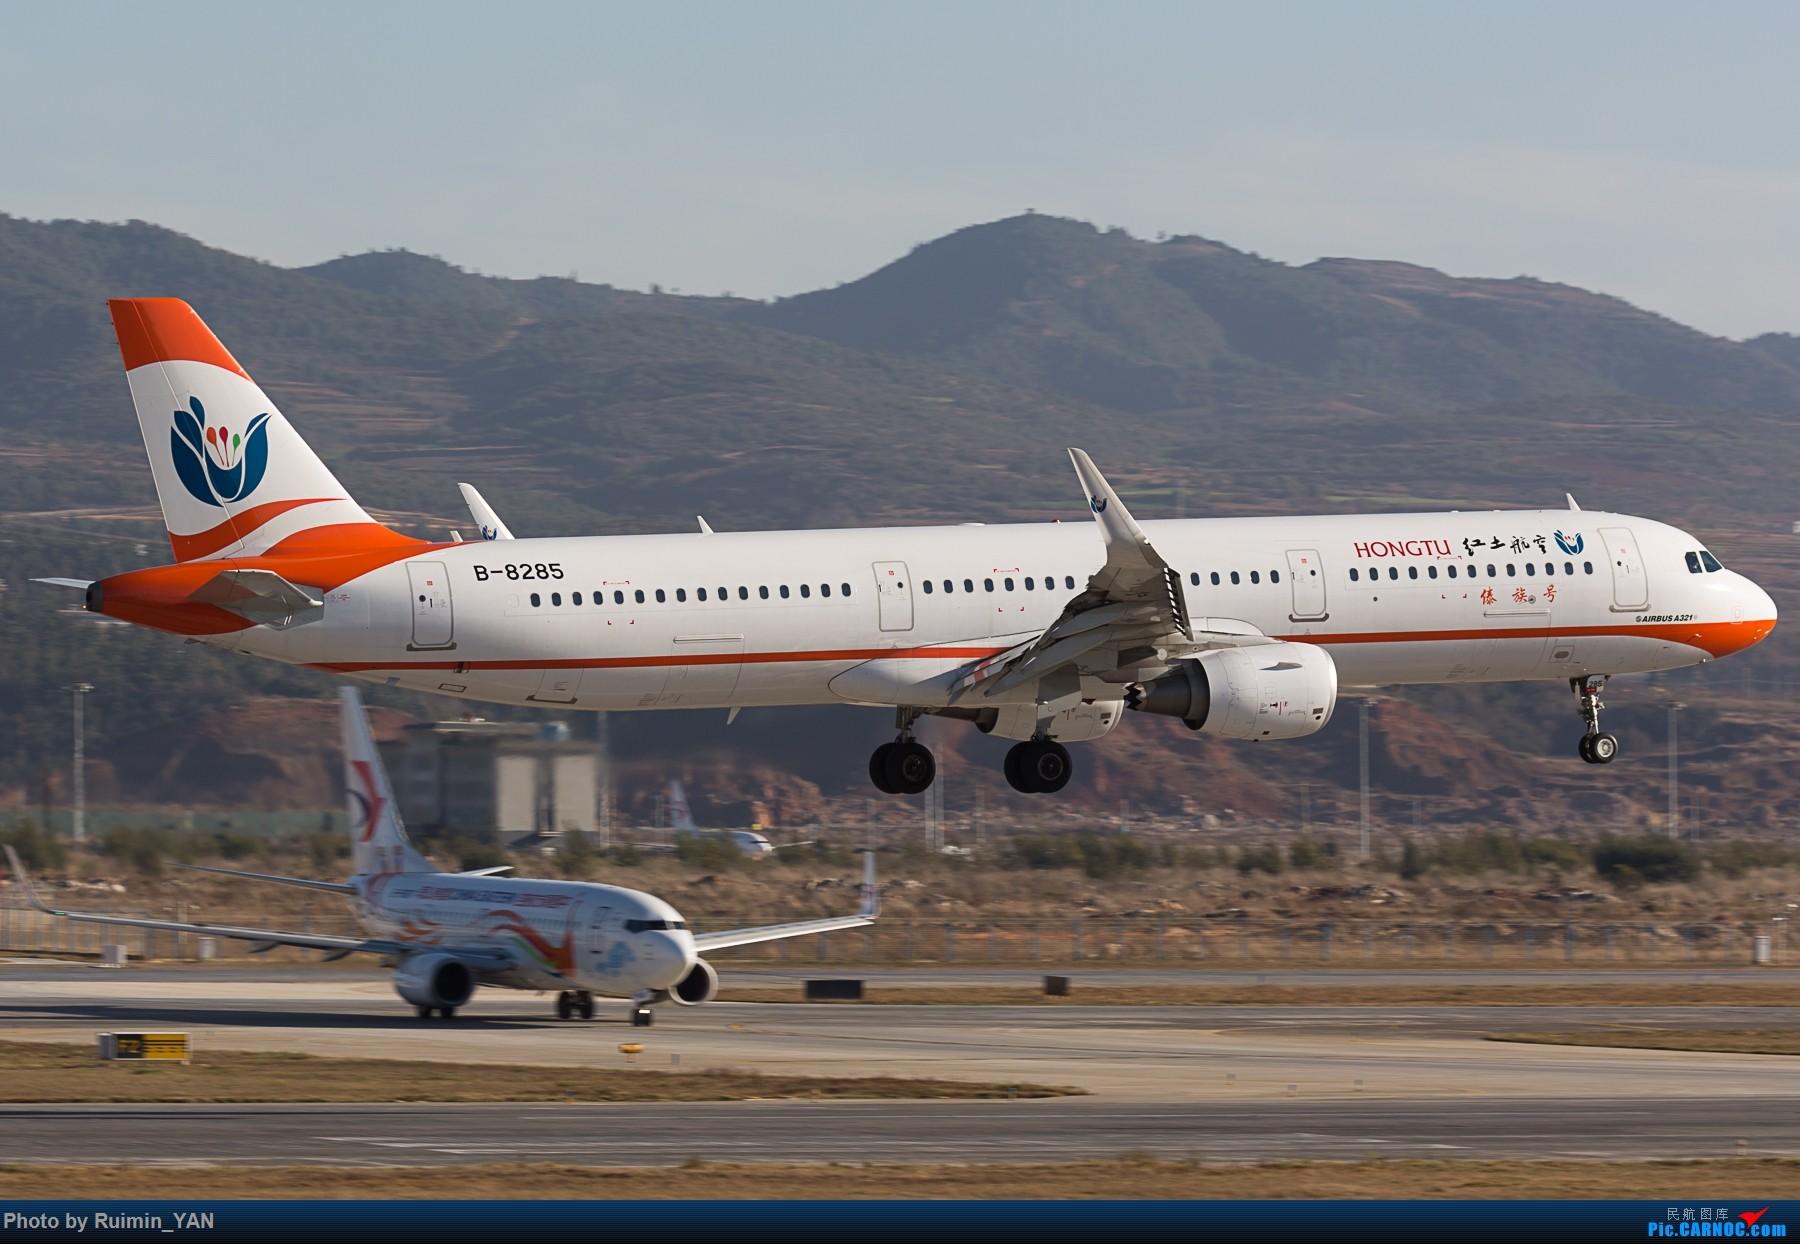 Re:【KMG】红土航空(A6) 傣族号B-8285 傈僳族号B-8318 A321 AIRBUS A321-200 B-8285 中国昆明长水国际机场